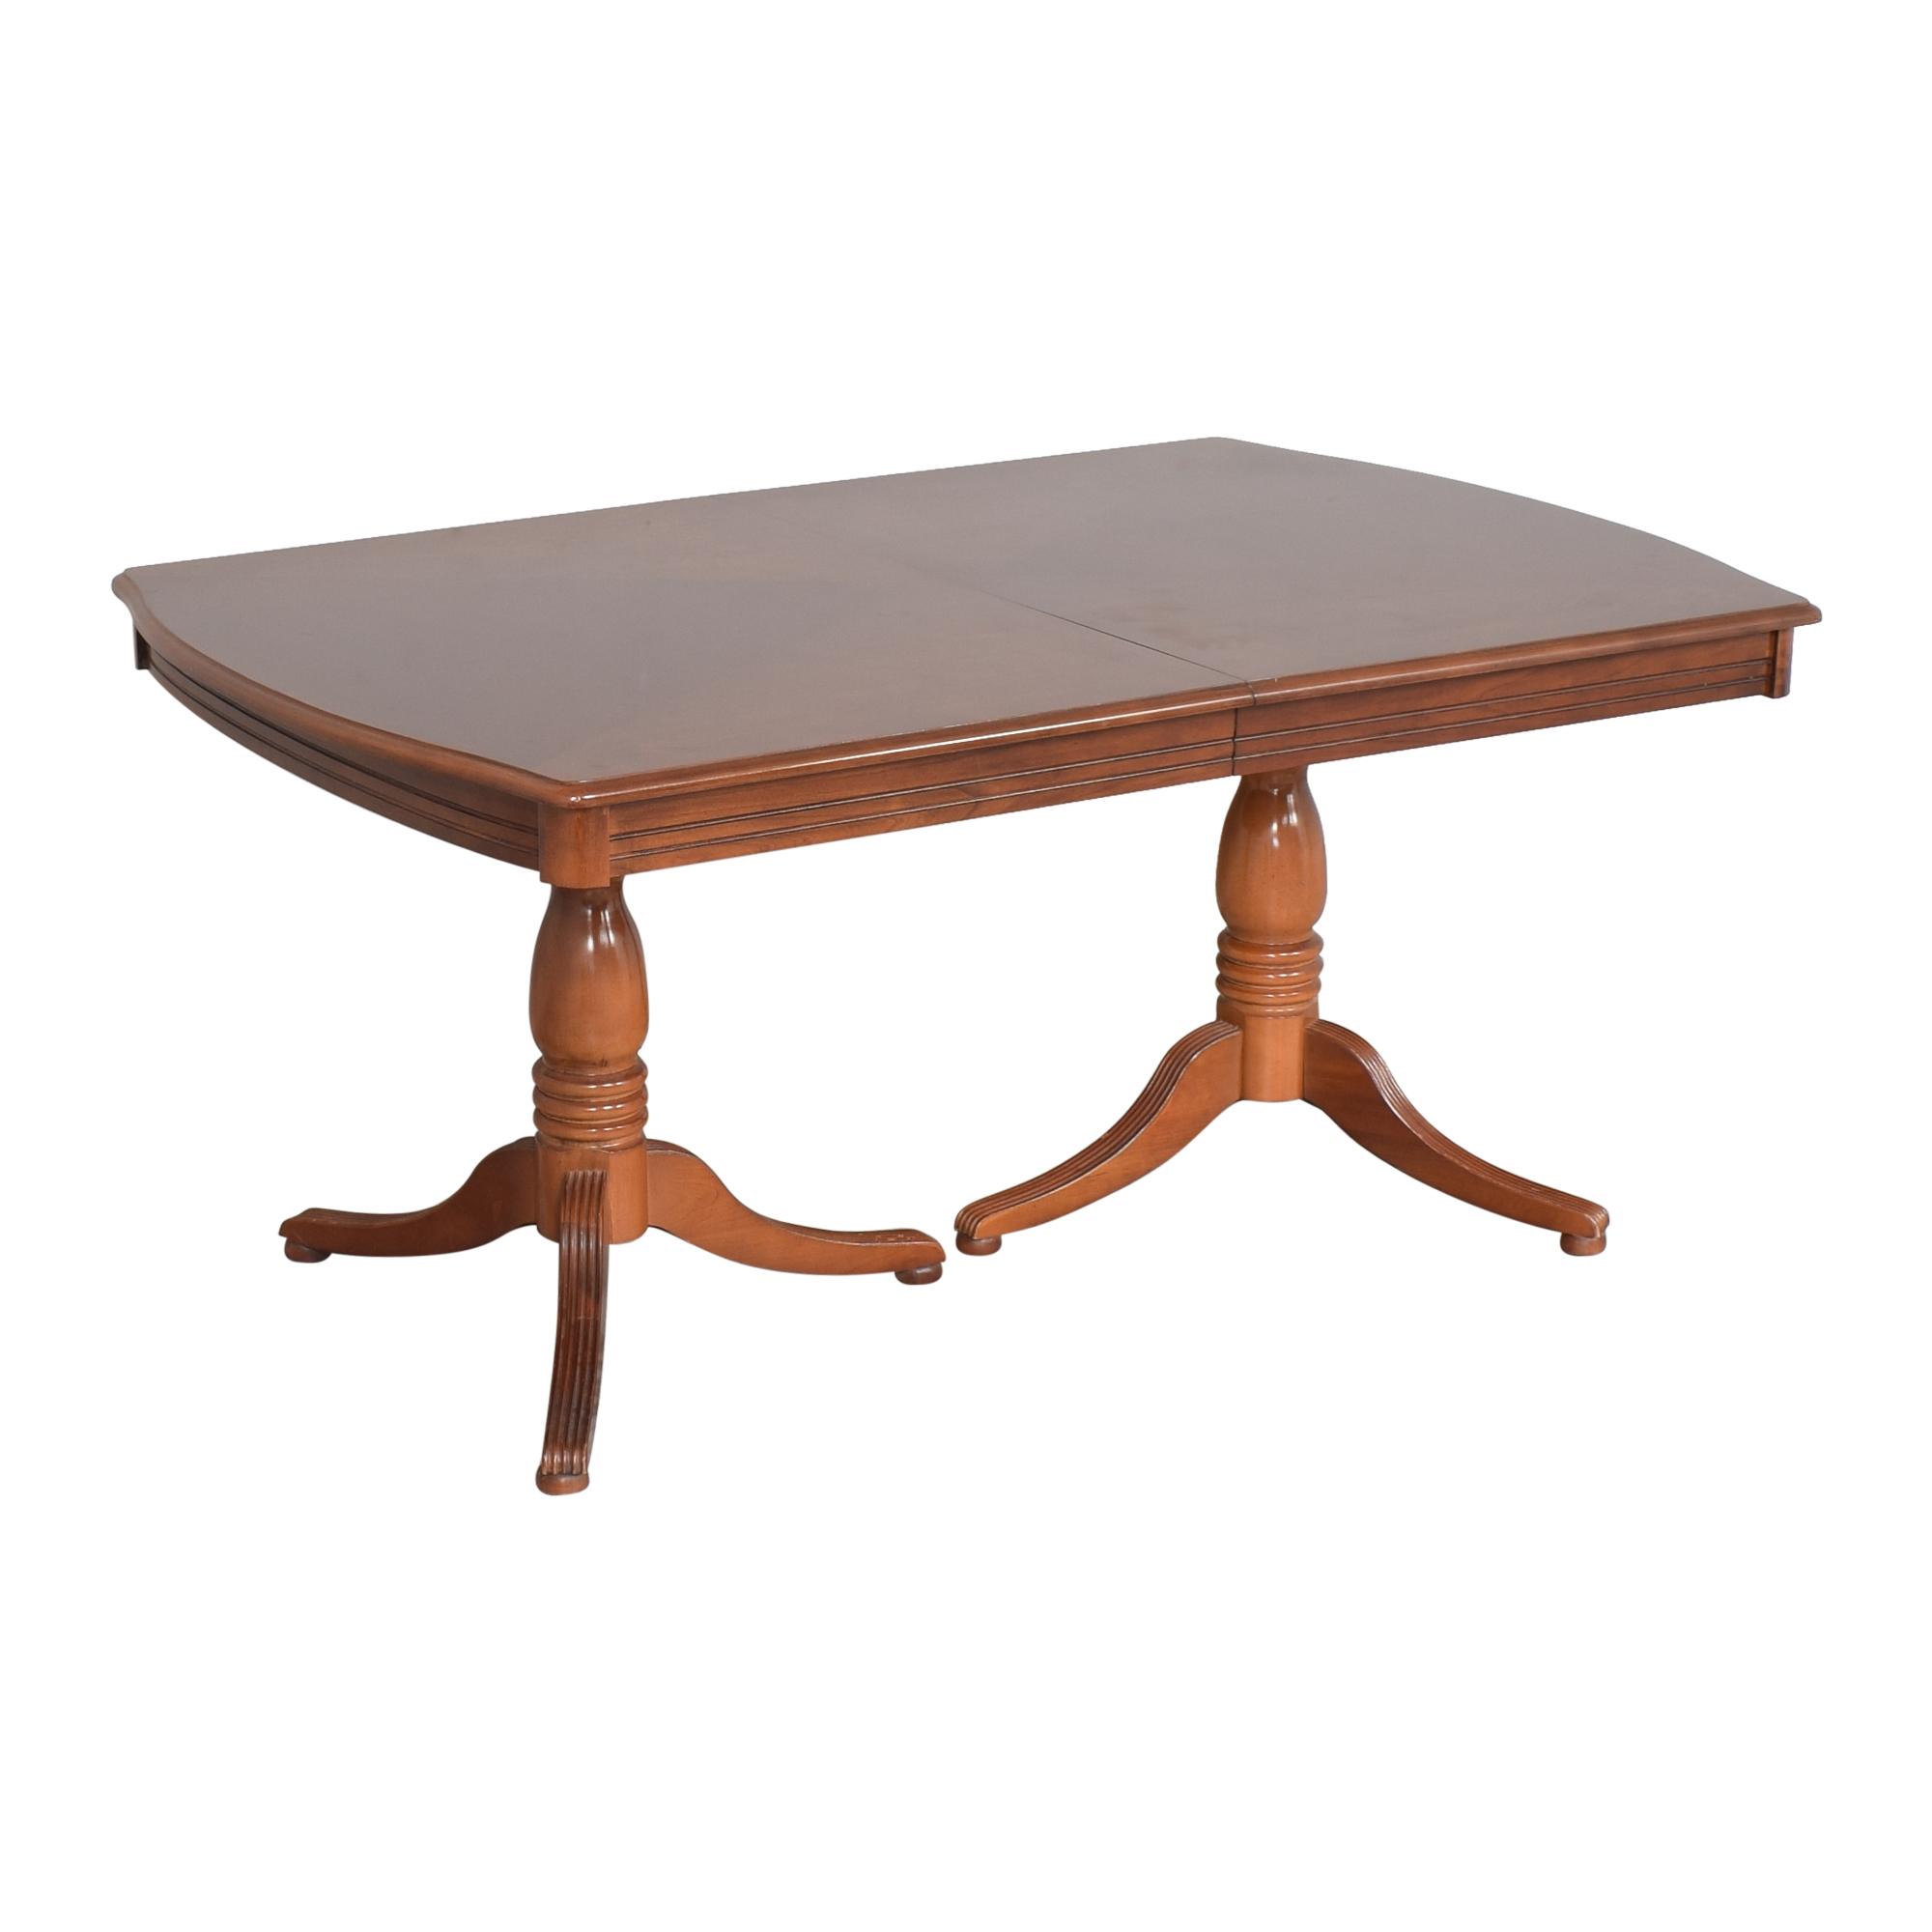 Bassett Extendable Dining Table sale